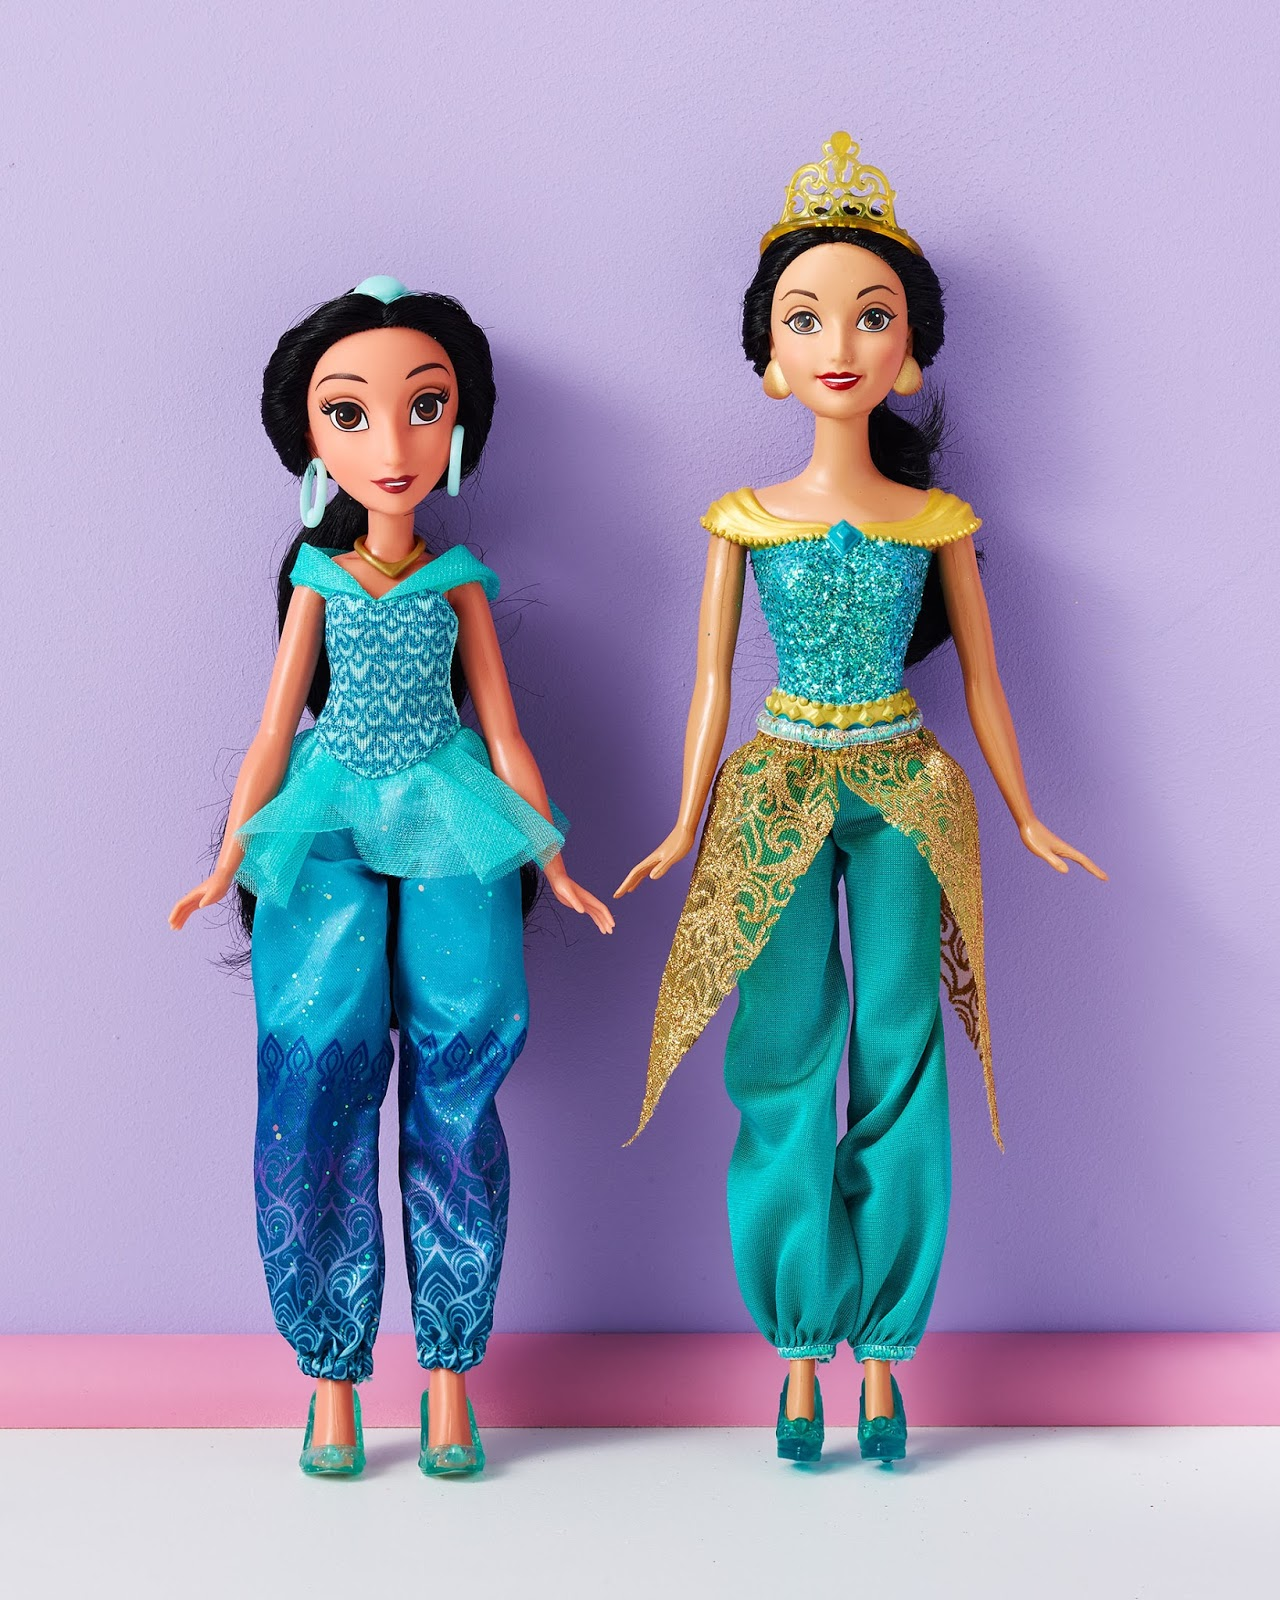 Liikaa Disney Tavaraa Kun Hasbro Kaappasi Disneyn